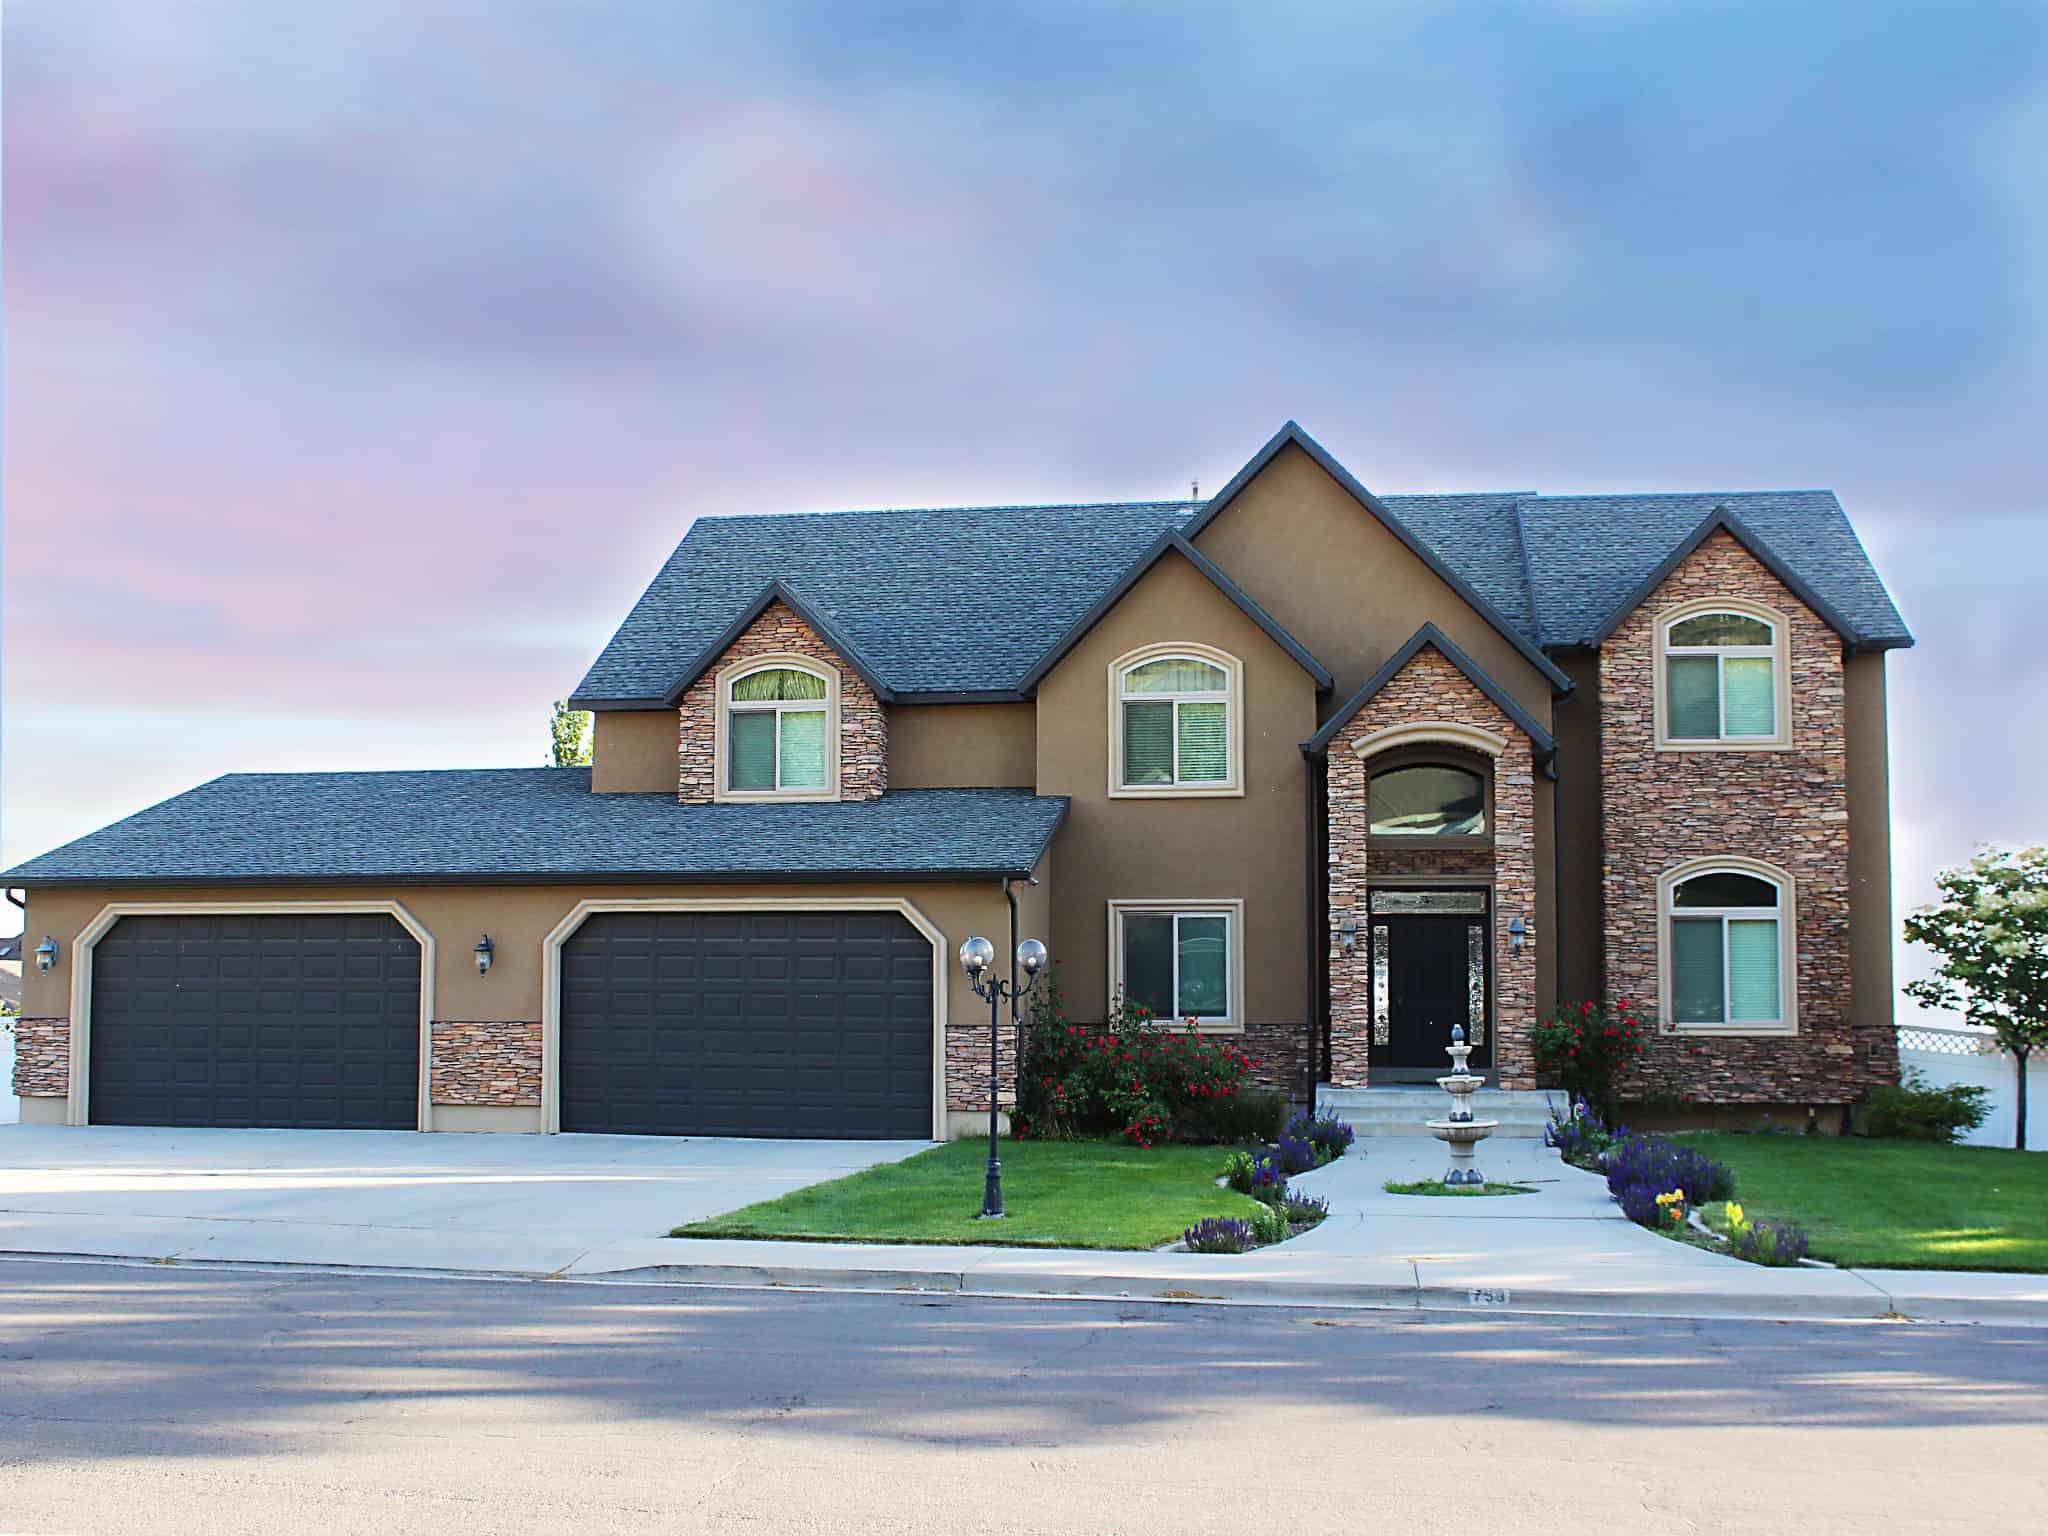 House for sale in Orem Utah